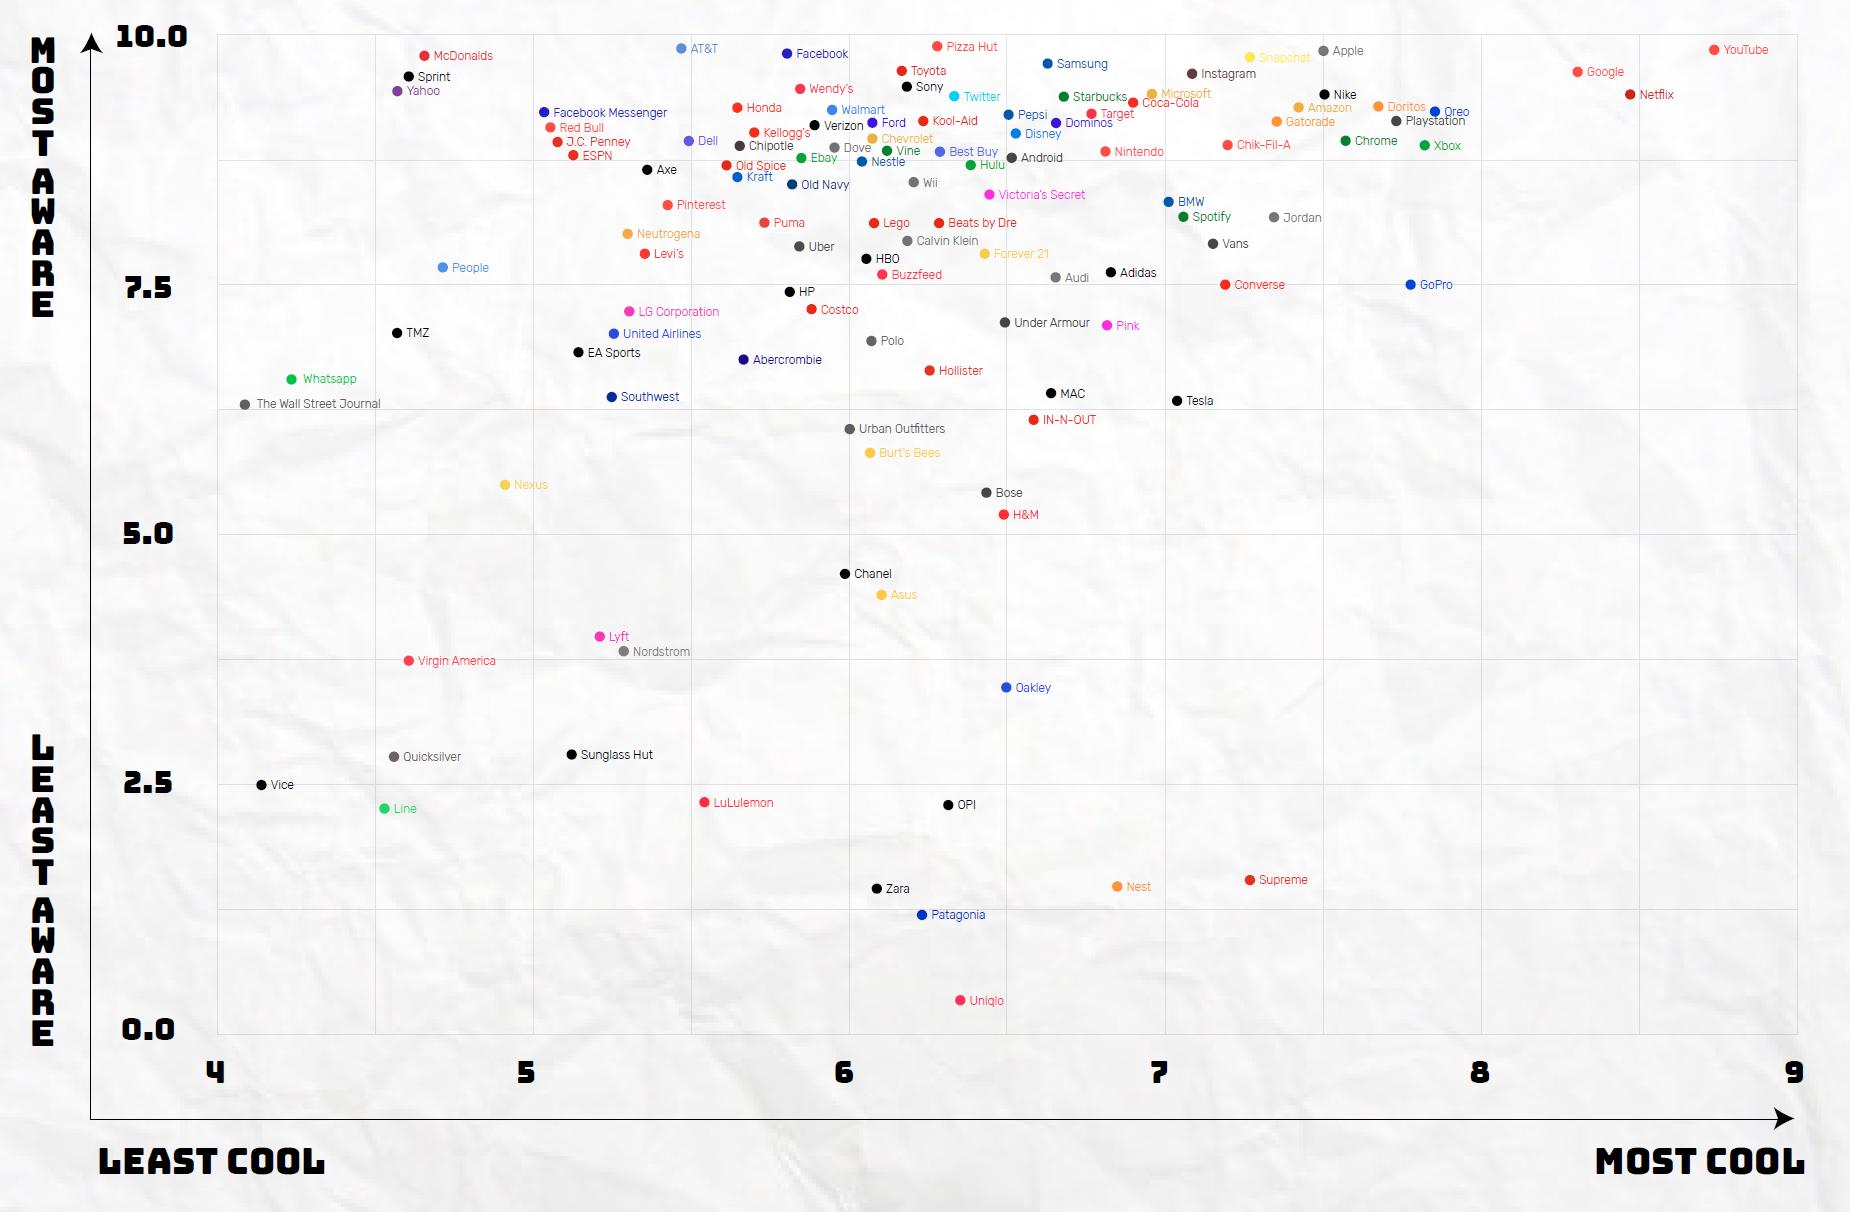 Google-Survey-brands-13-17-year-olds-find-cool